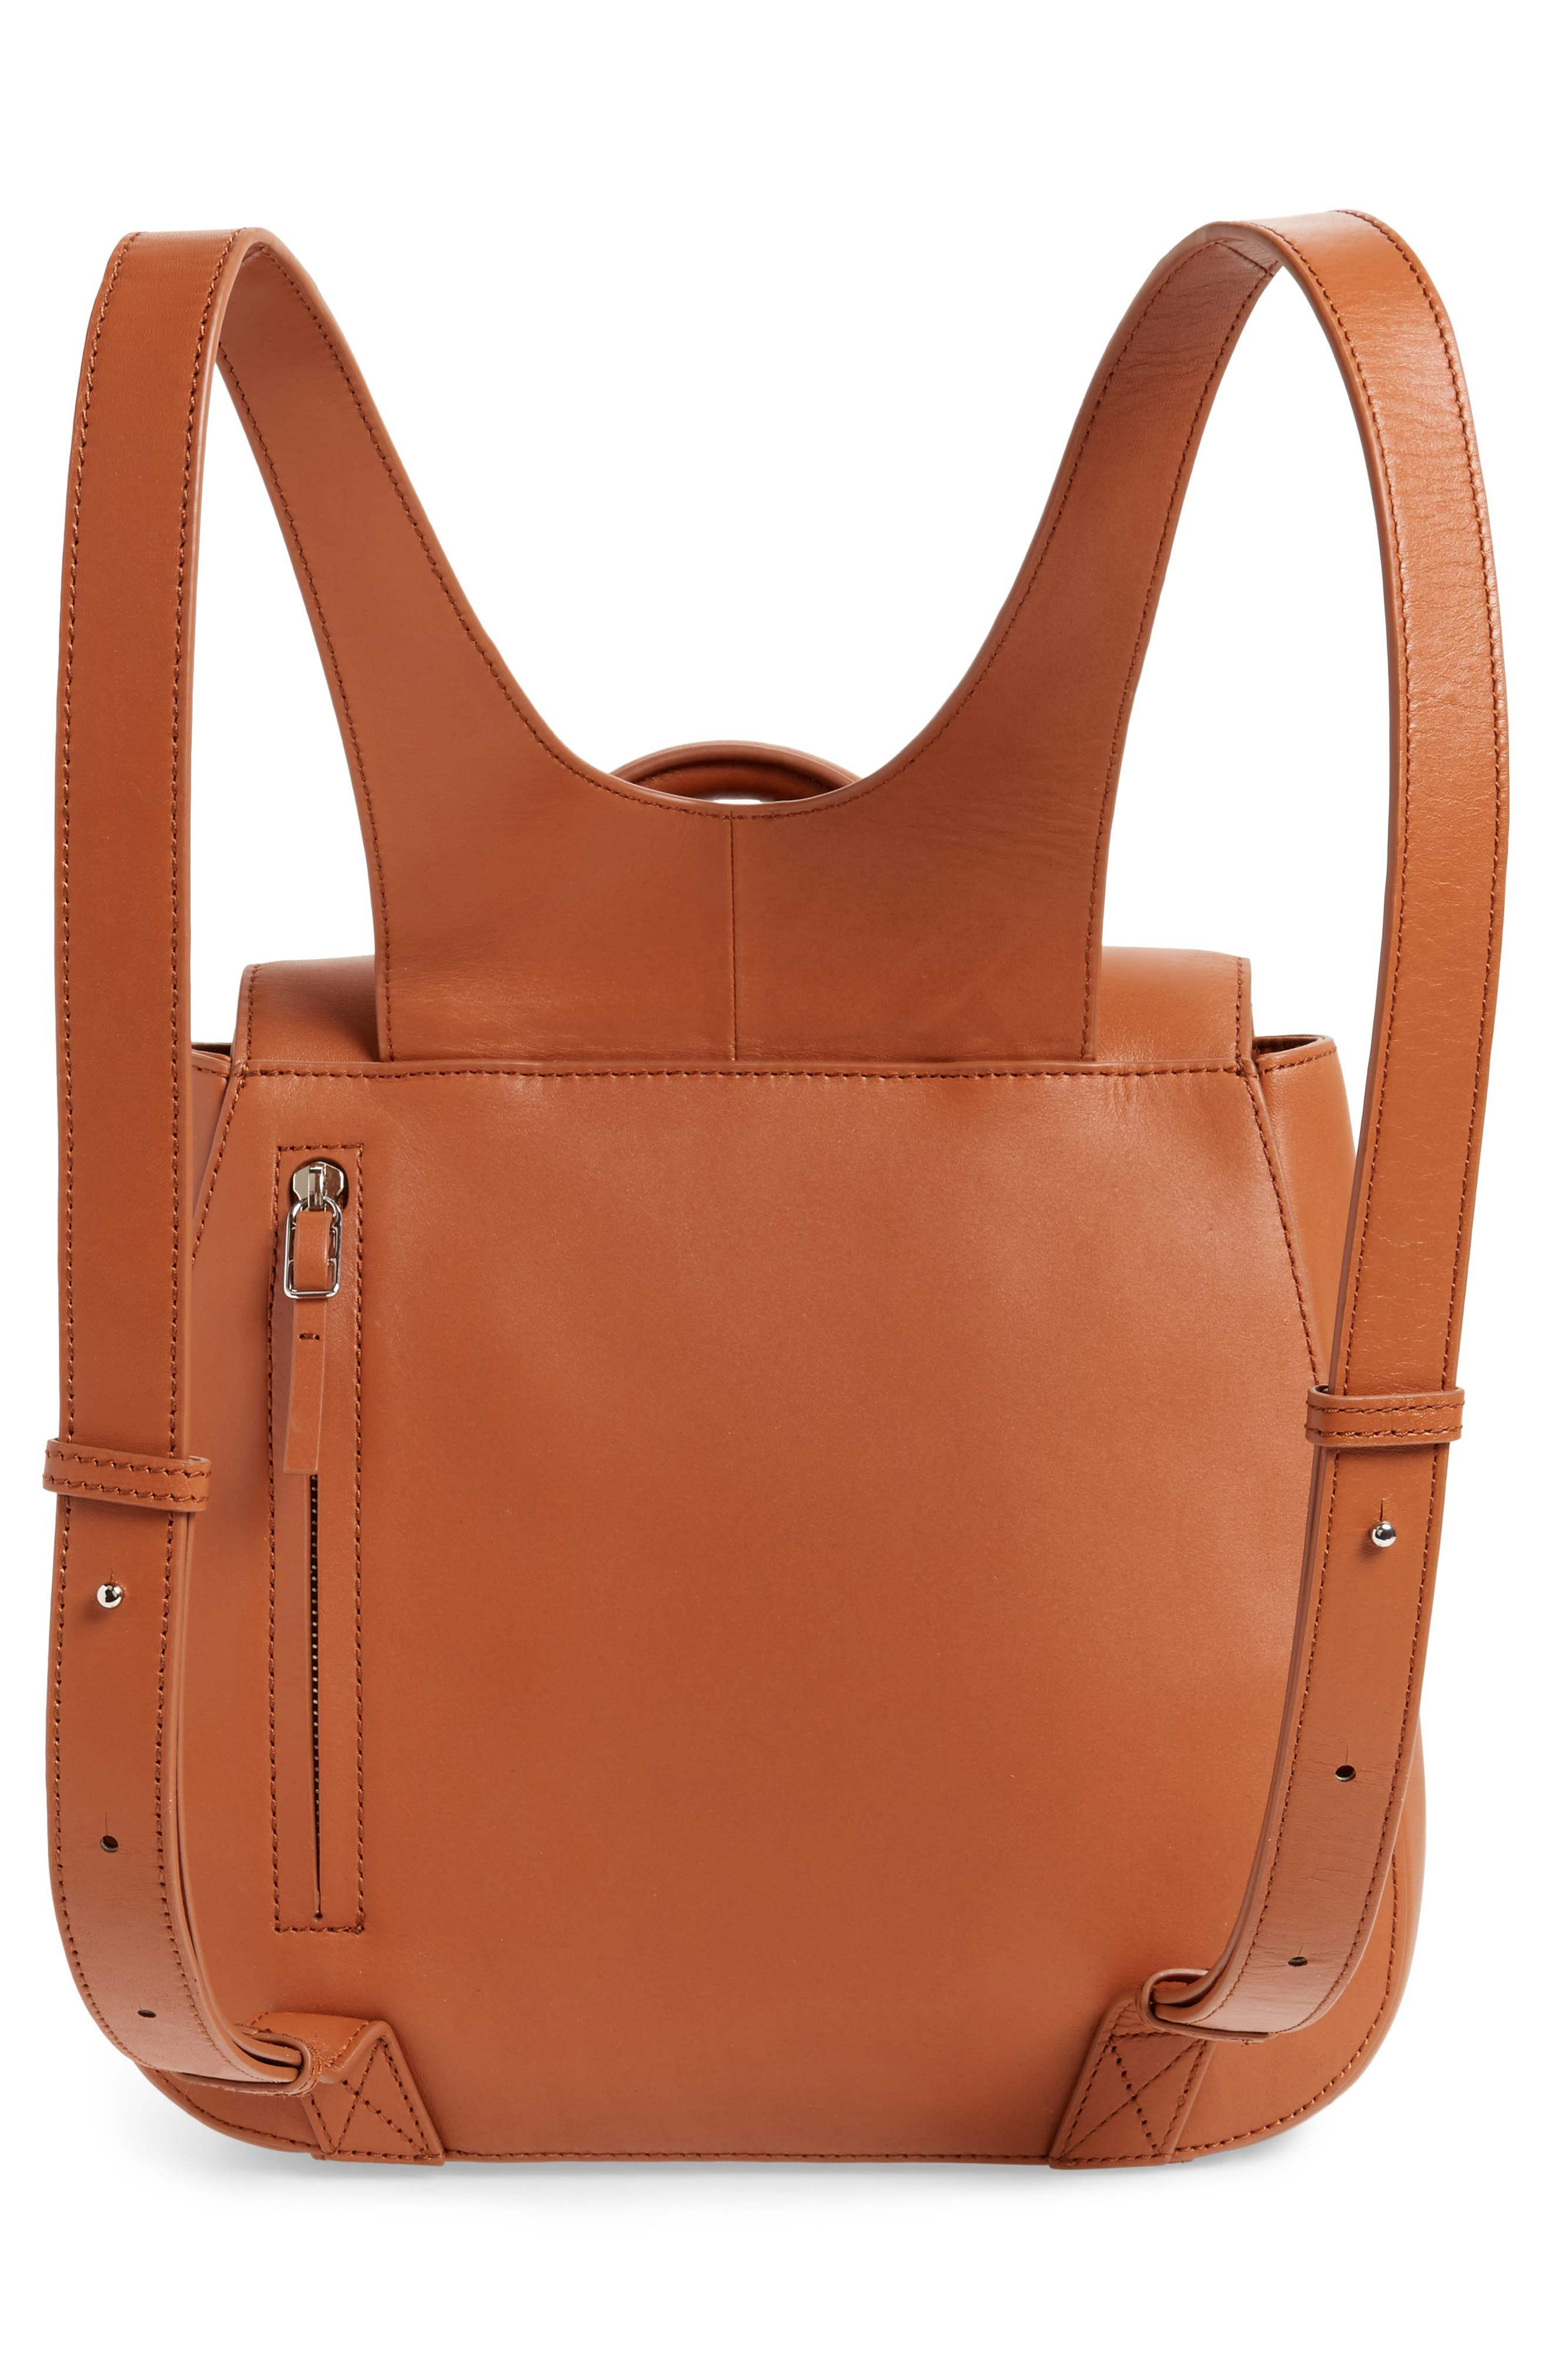 Kate Calfskin Leather Backpack,                             Alternate thumbnail 3, color,                             200